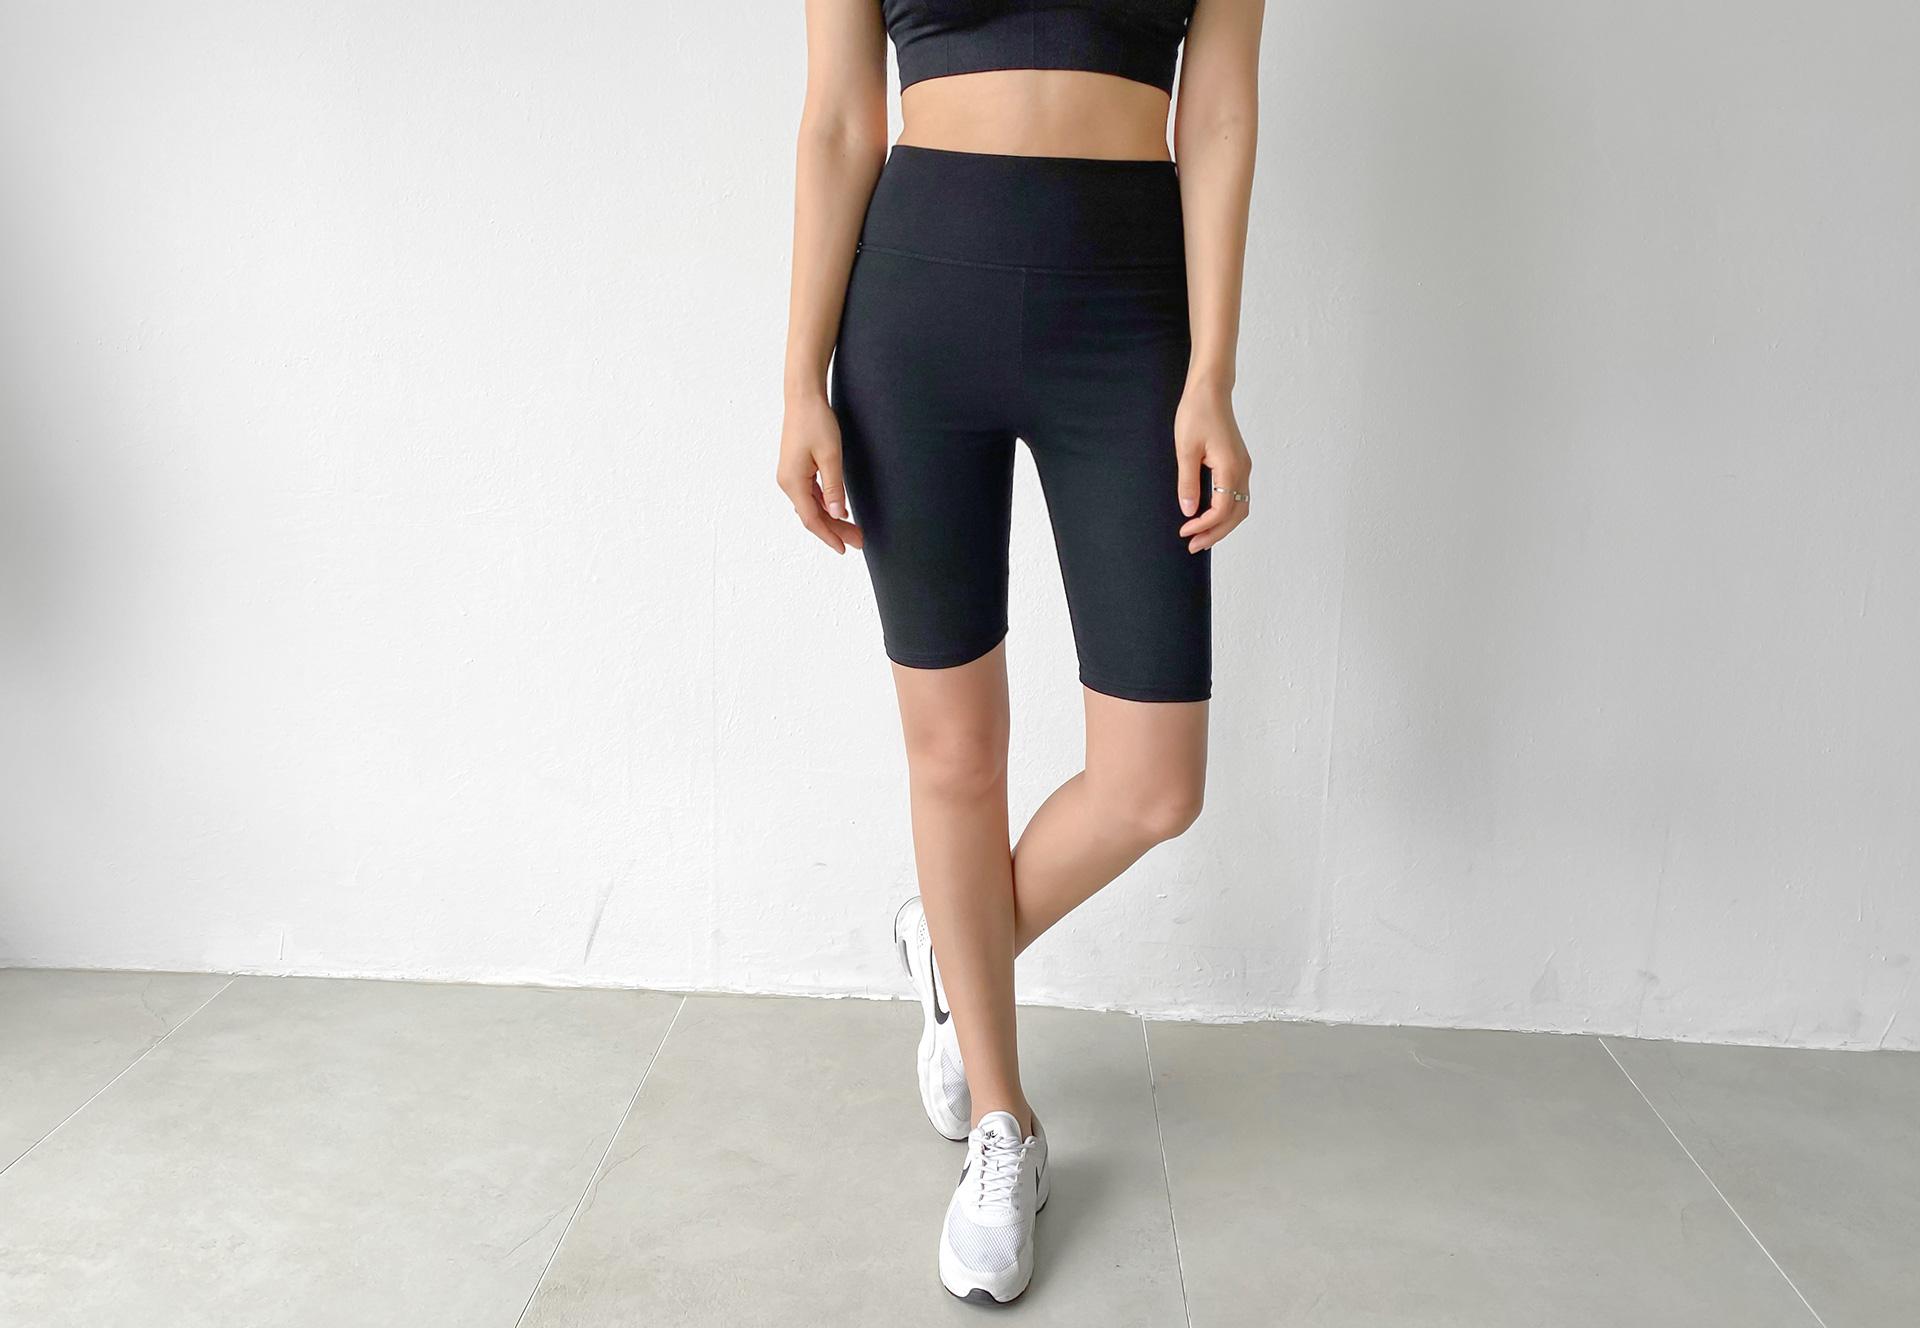 Soft tension plain 5 part leggings #86252